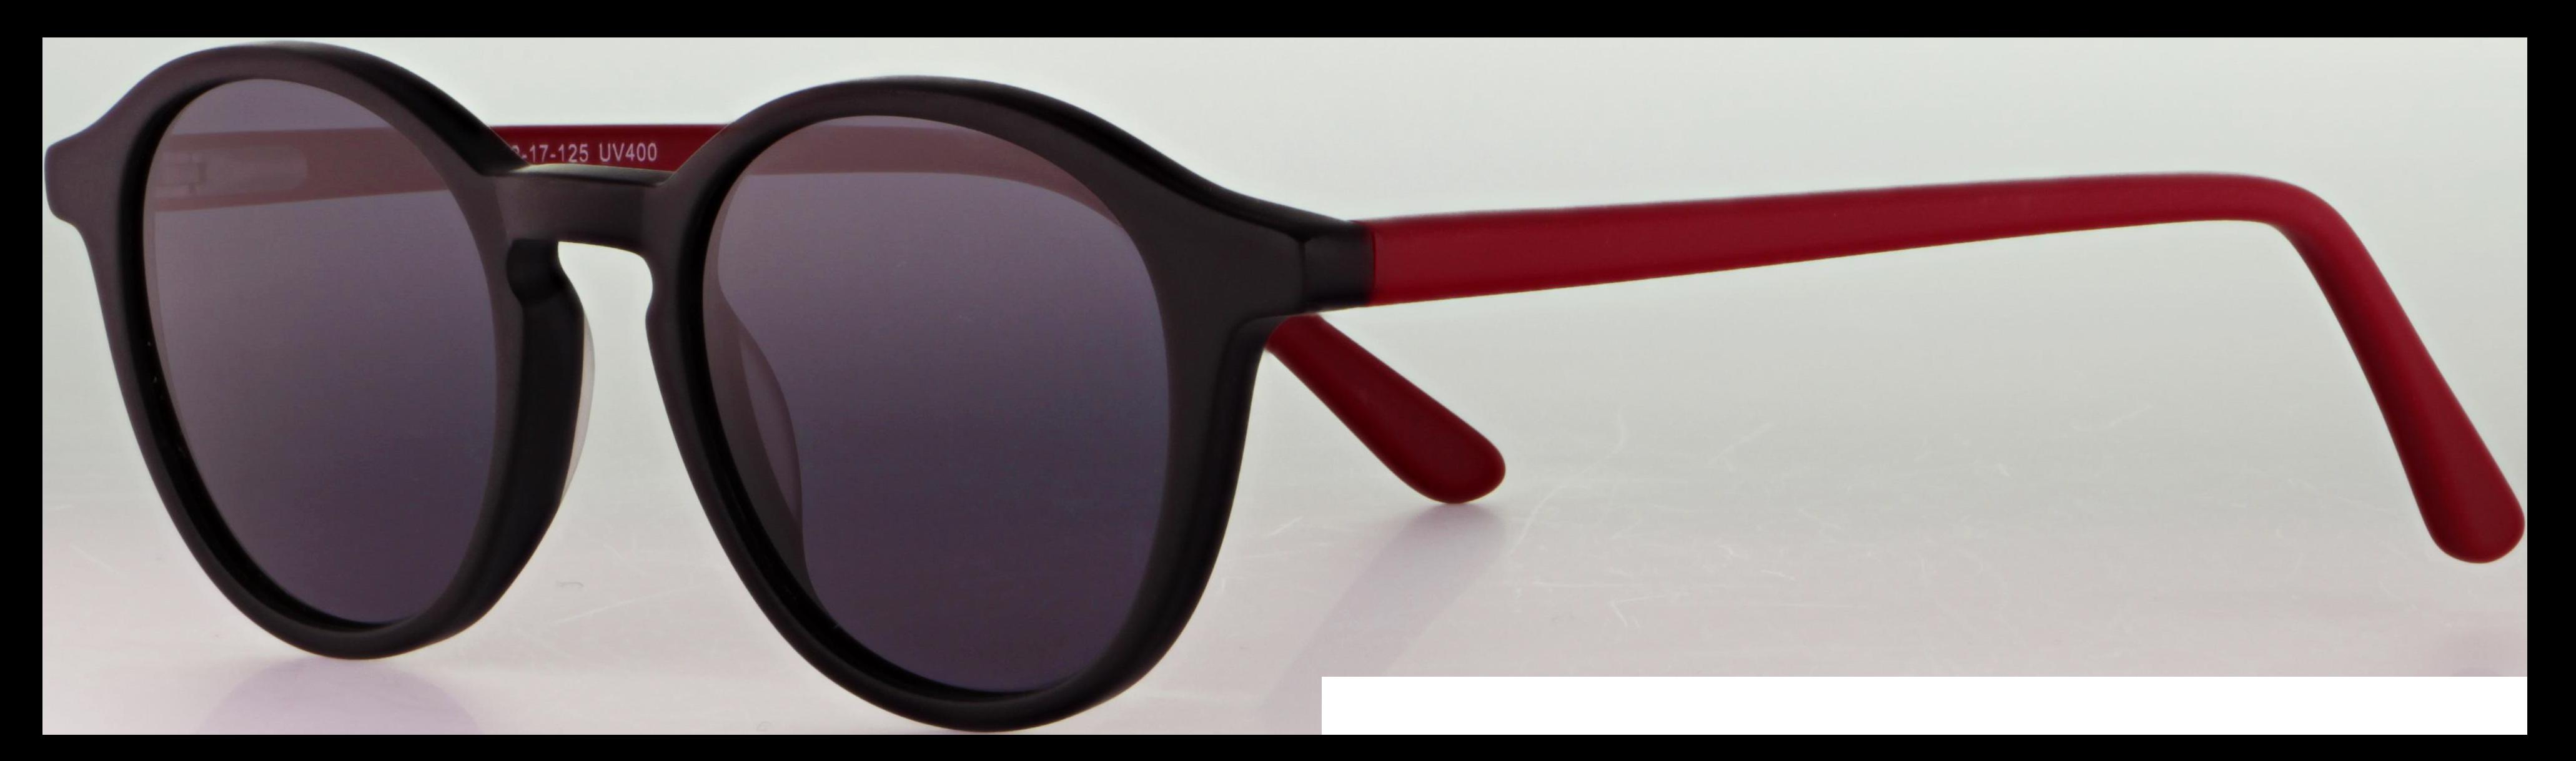 abele optik Kindersonnenbrille 718752